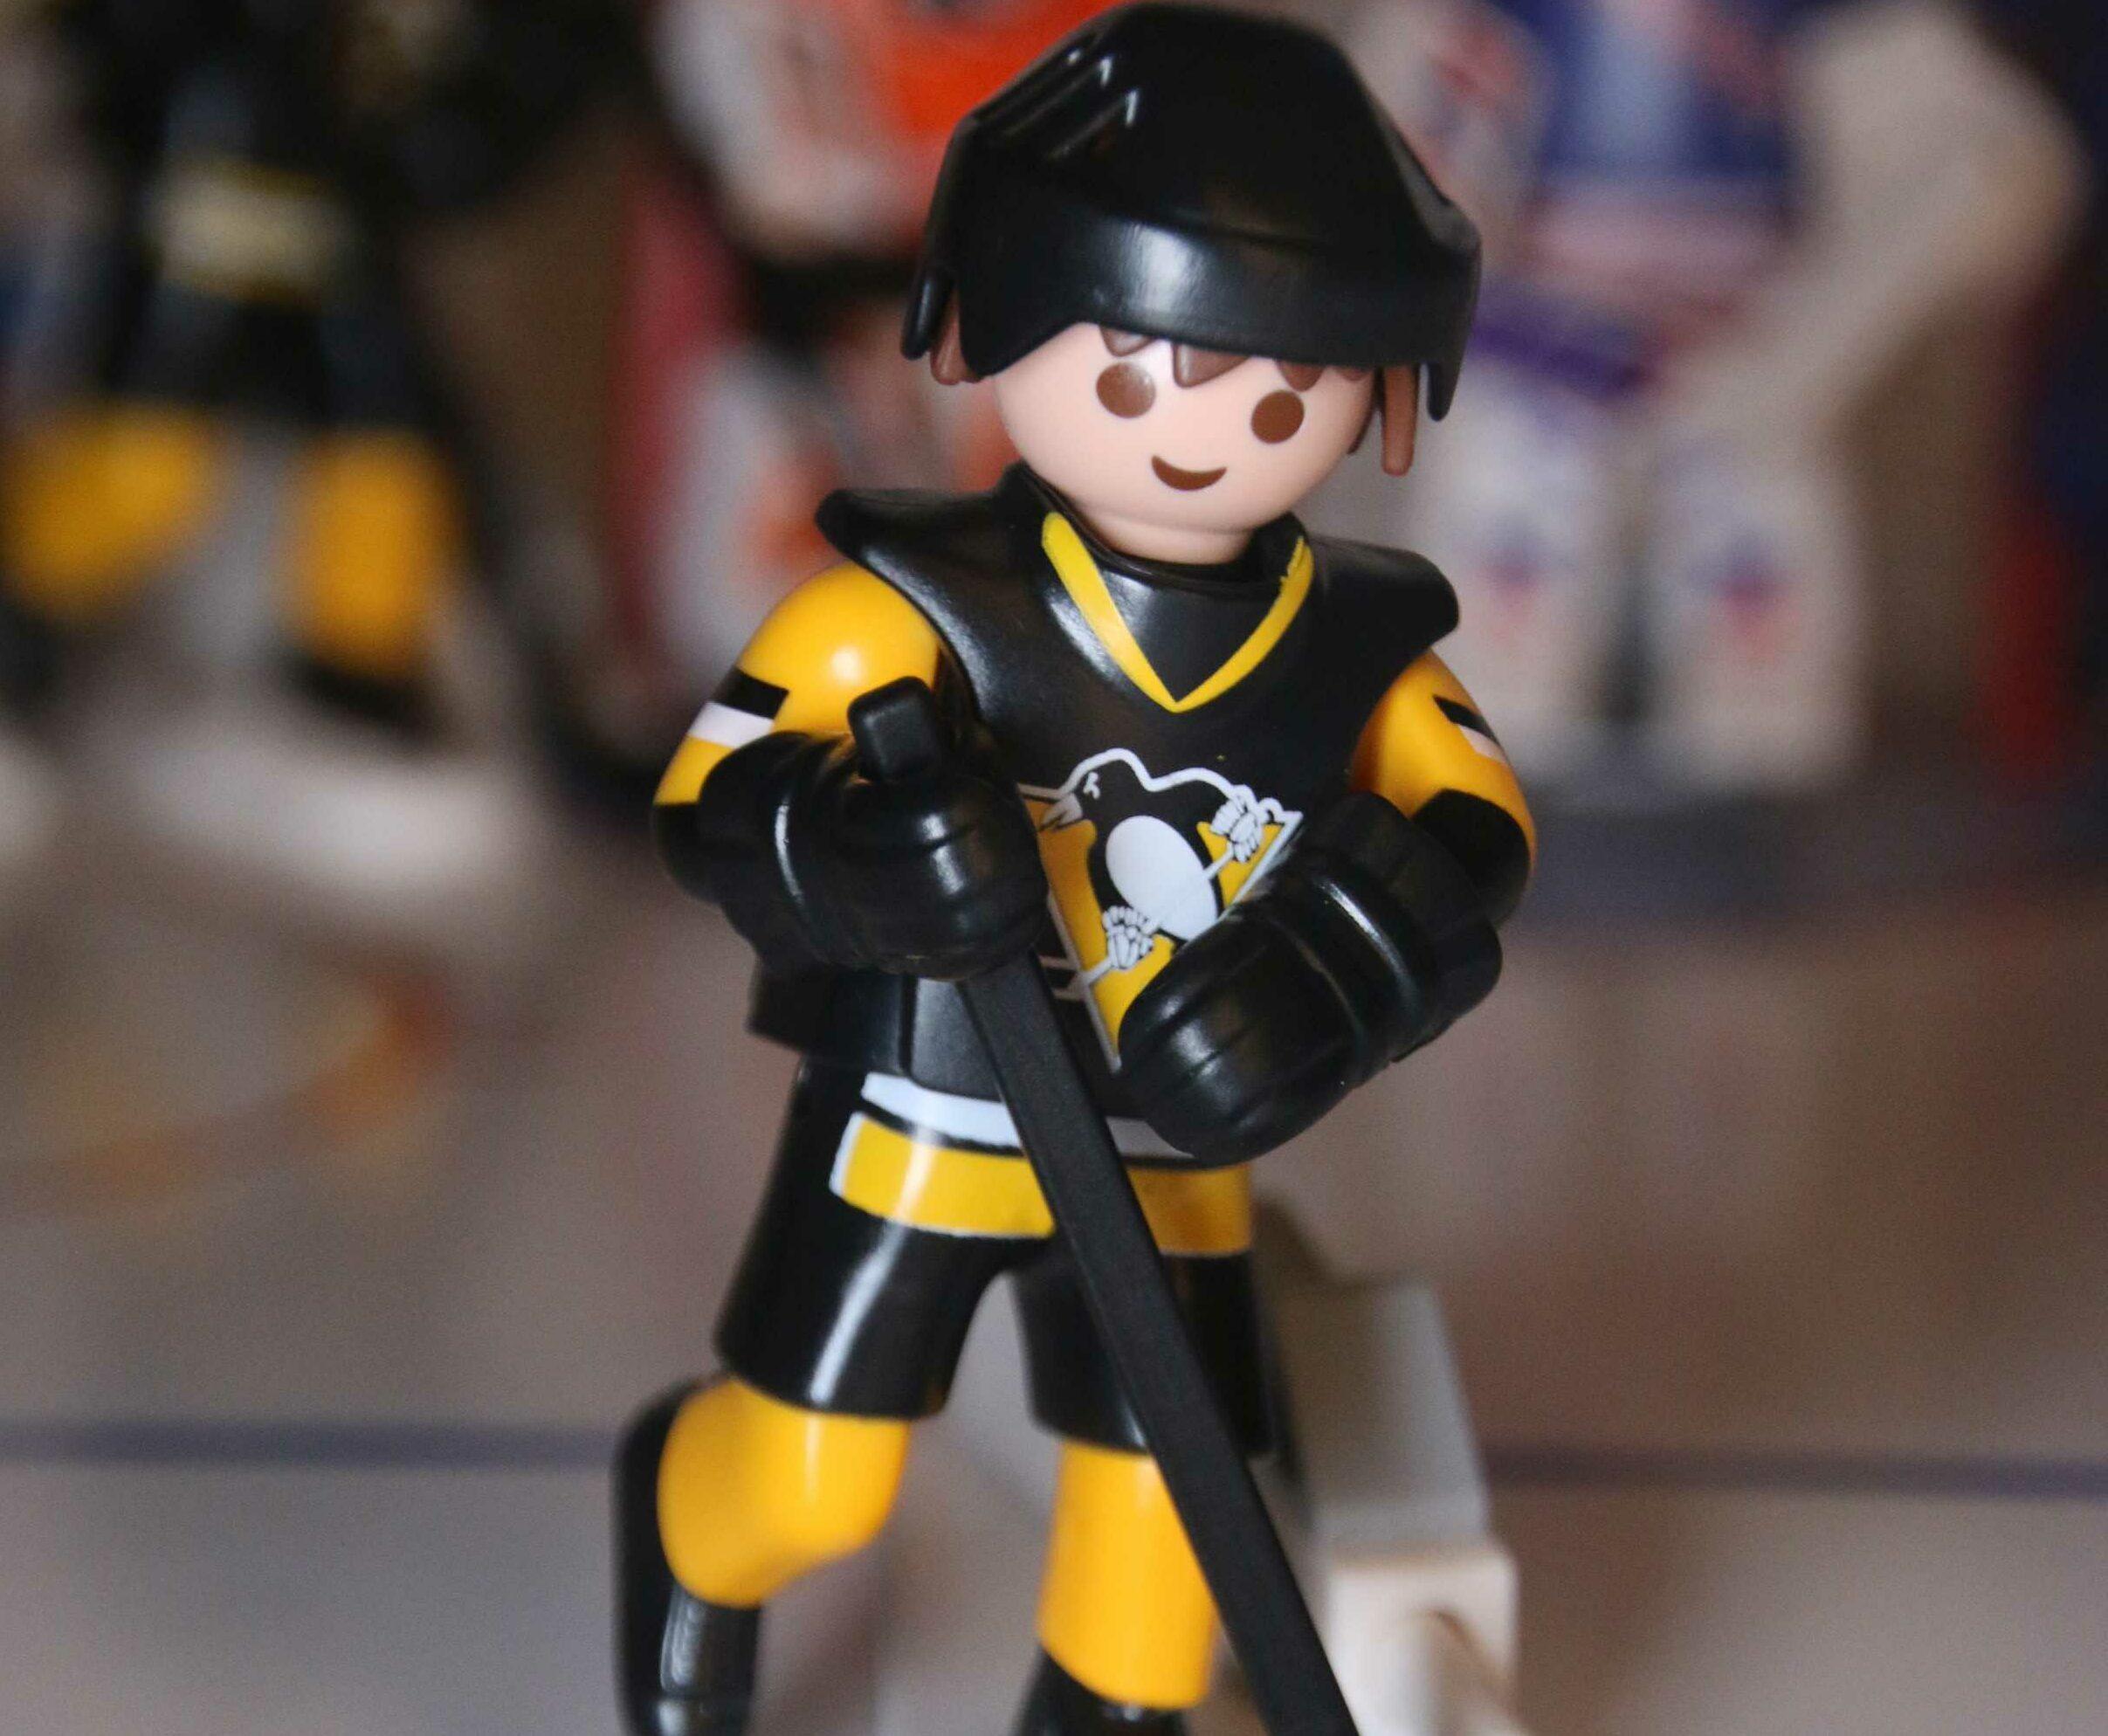 #026 NHL Burke und Hextall in Pittsburgh – Abseits, Abstrafung und Abschied in Columbus + Fantasy Hockey